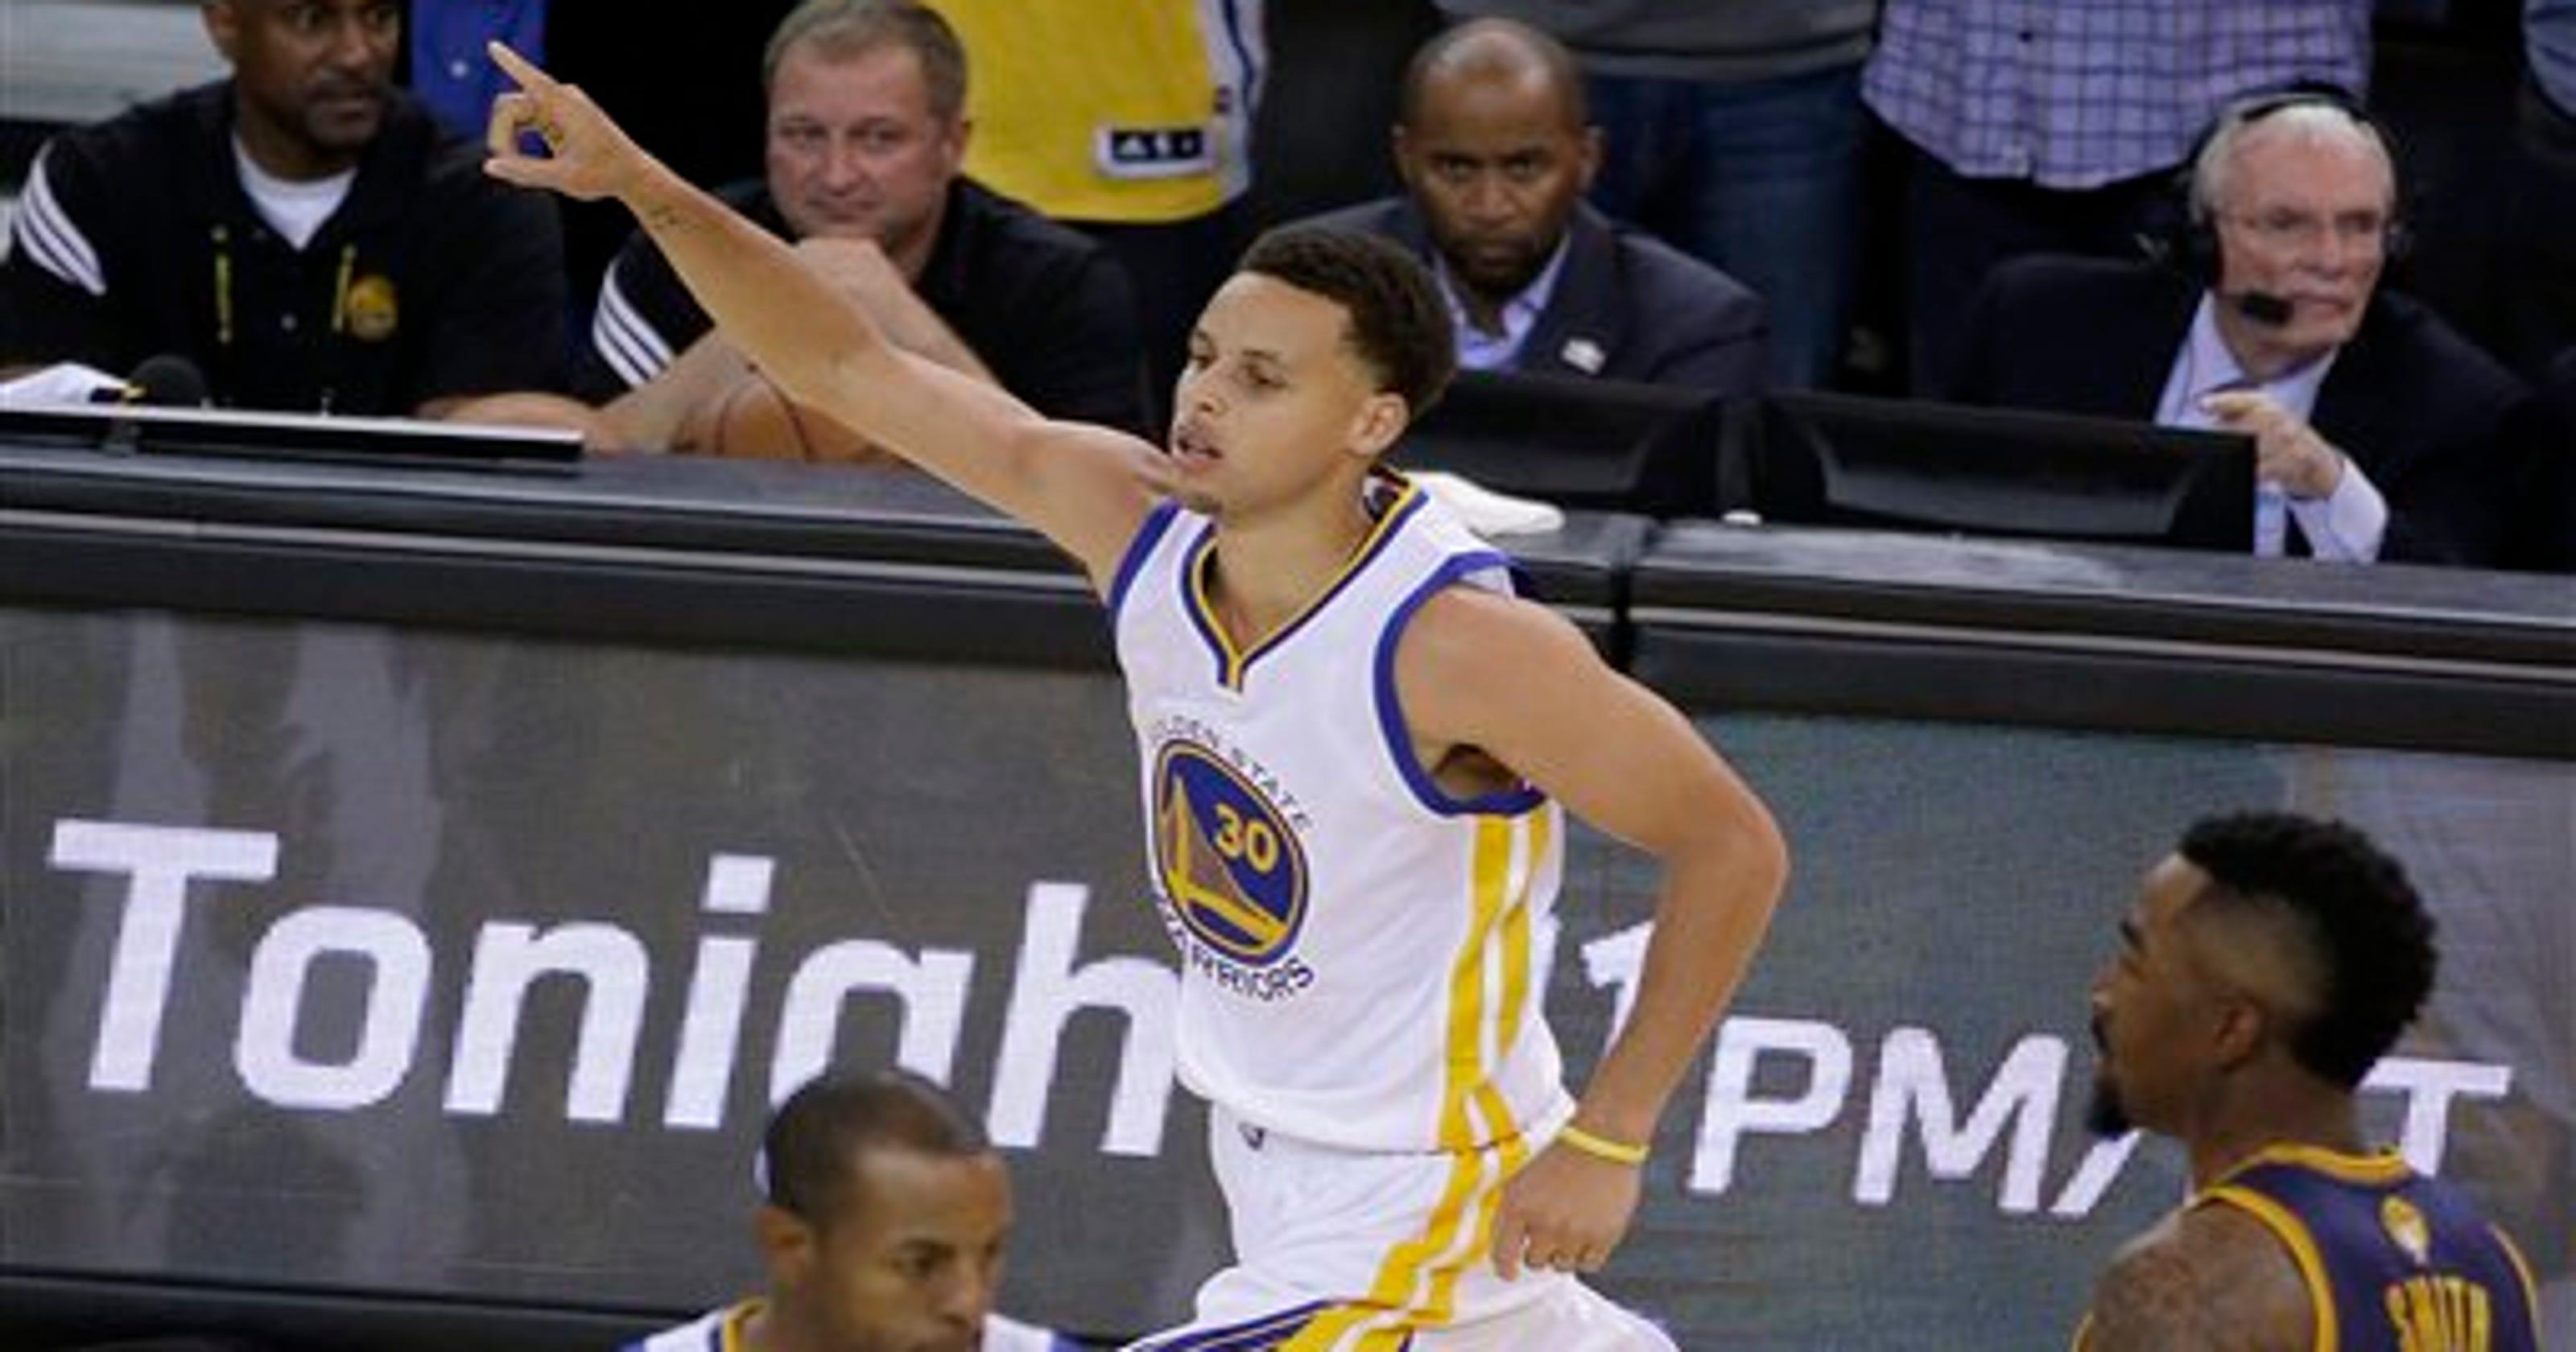 a7da74e65d44 NBA FINALS  Warriors win Game 1 over Cavaliers